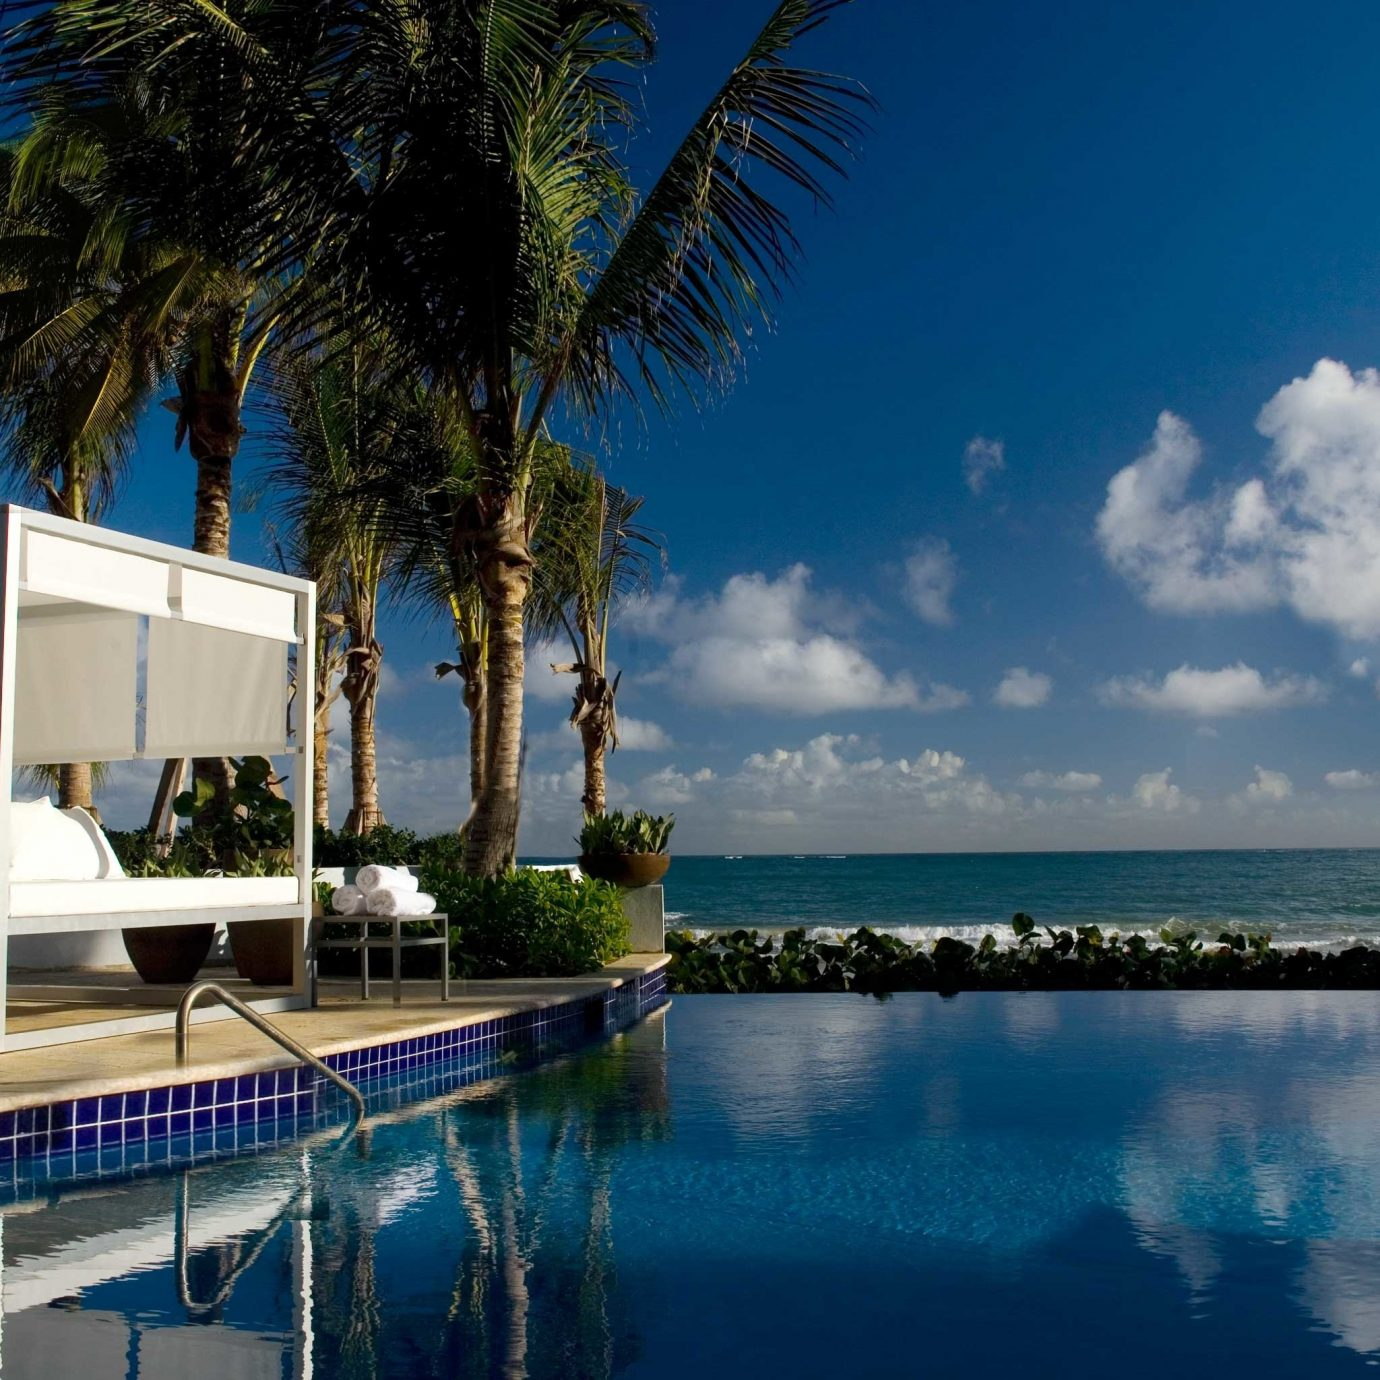 Beachfront Hotels Modern Pool Resort Romance Scenic views tree sky water swimming pool arecales Sea marina